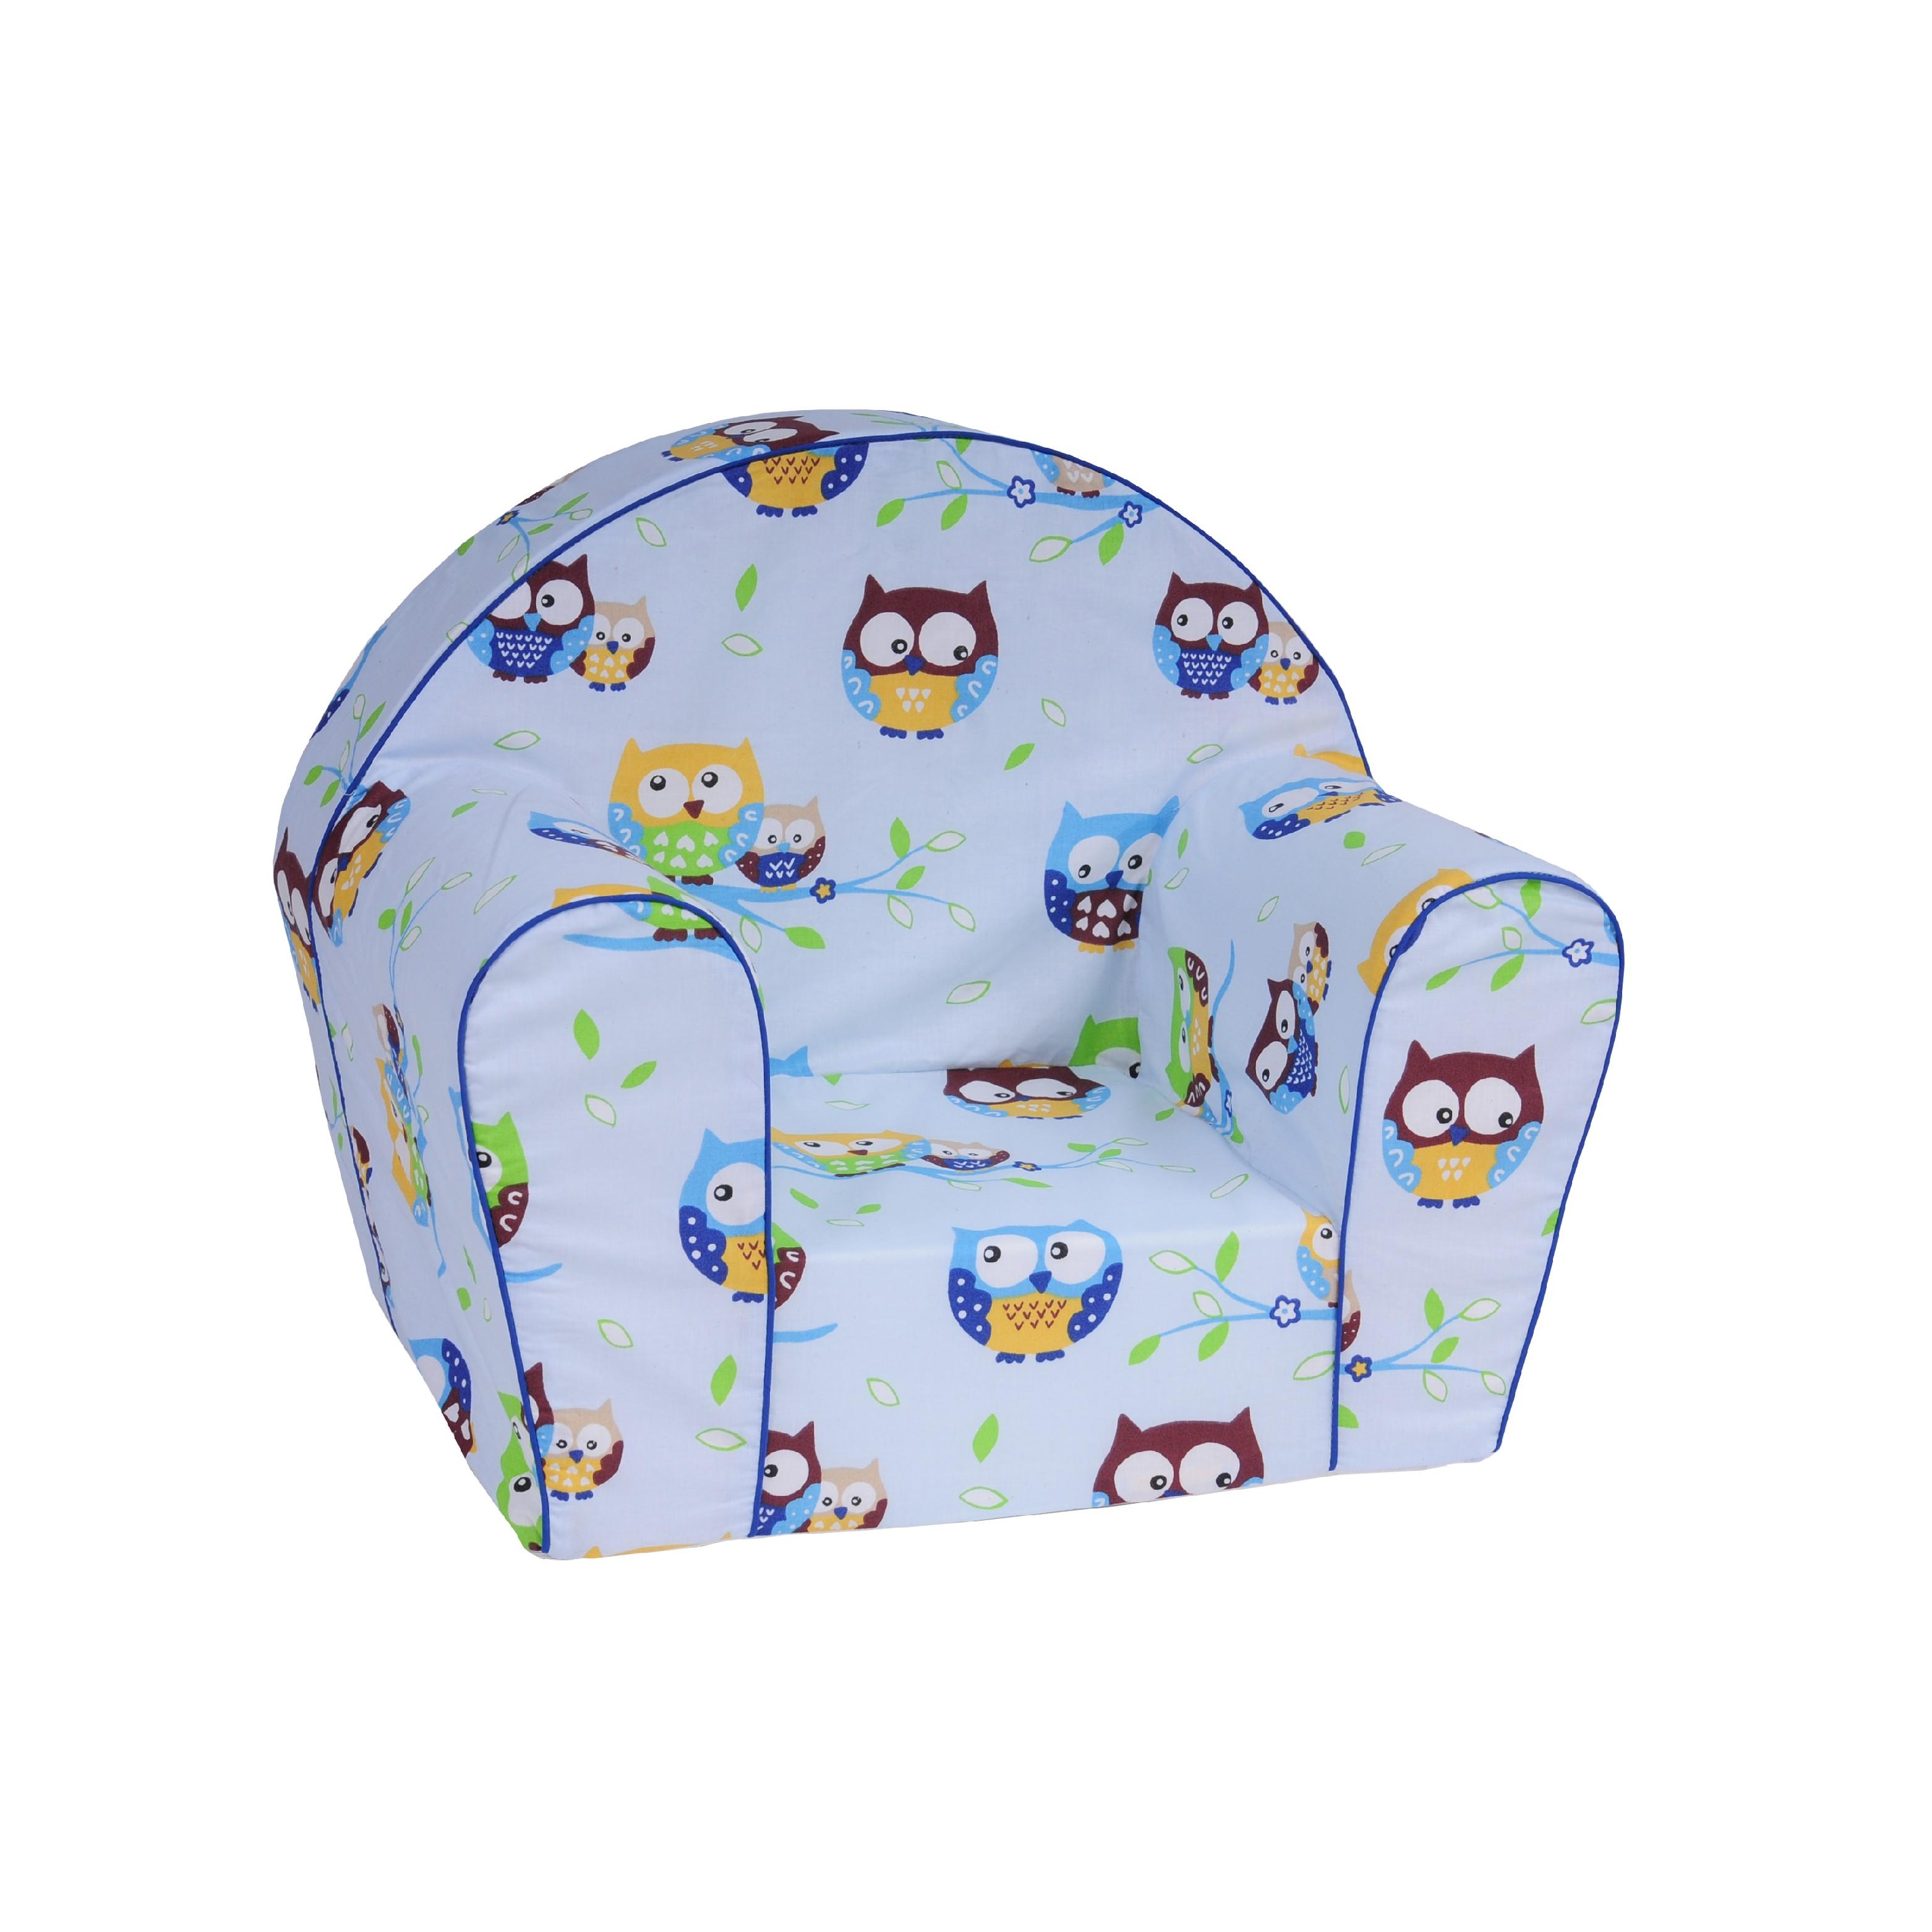 TEX-IM Dětské křesílko Baby Vzor: Modrá sova